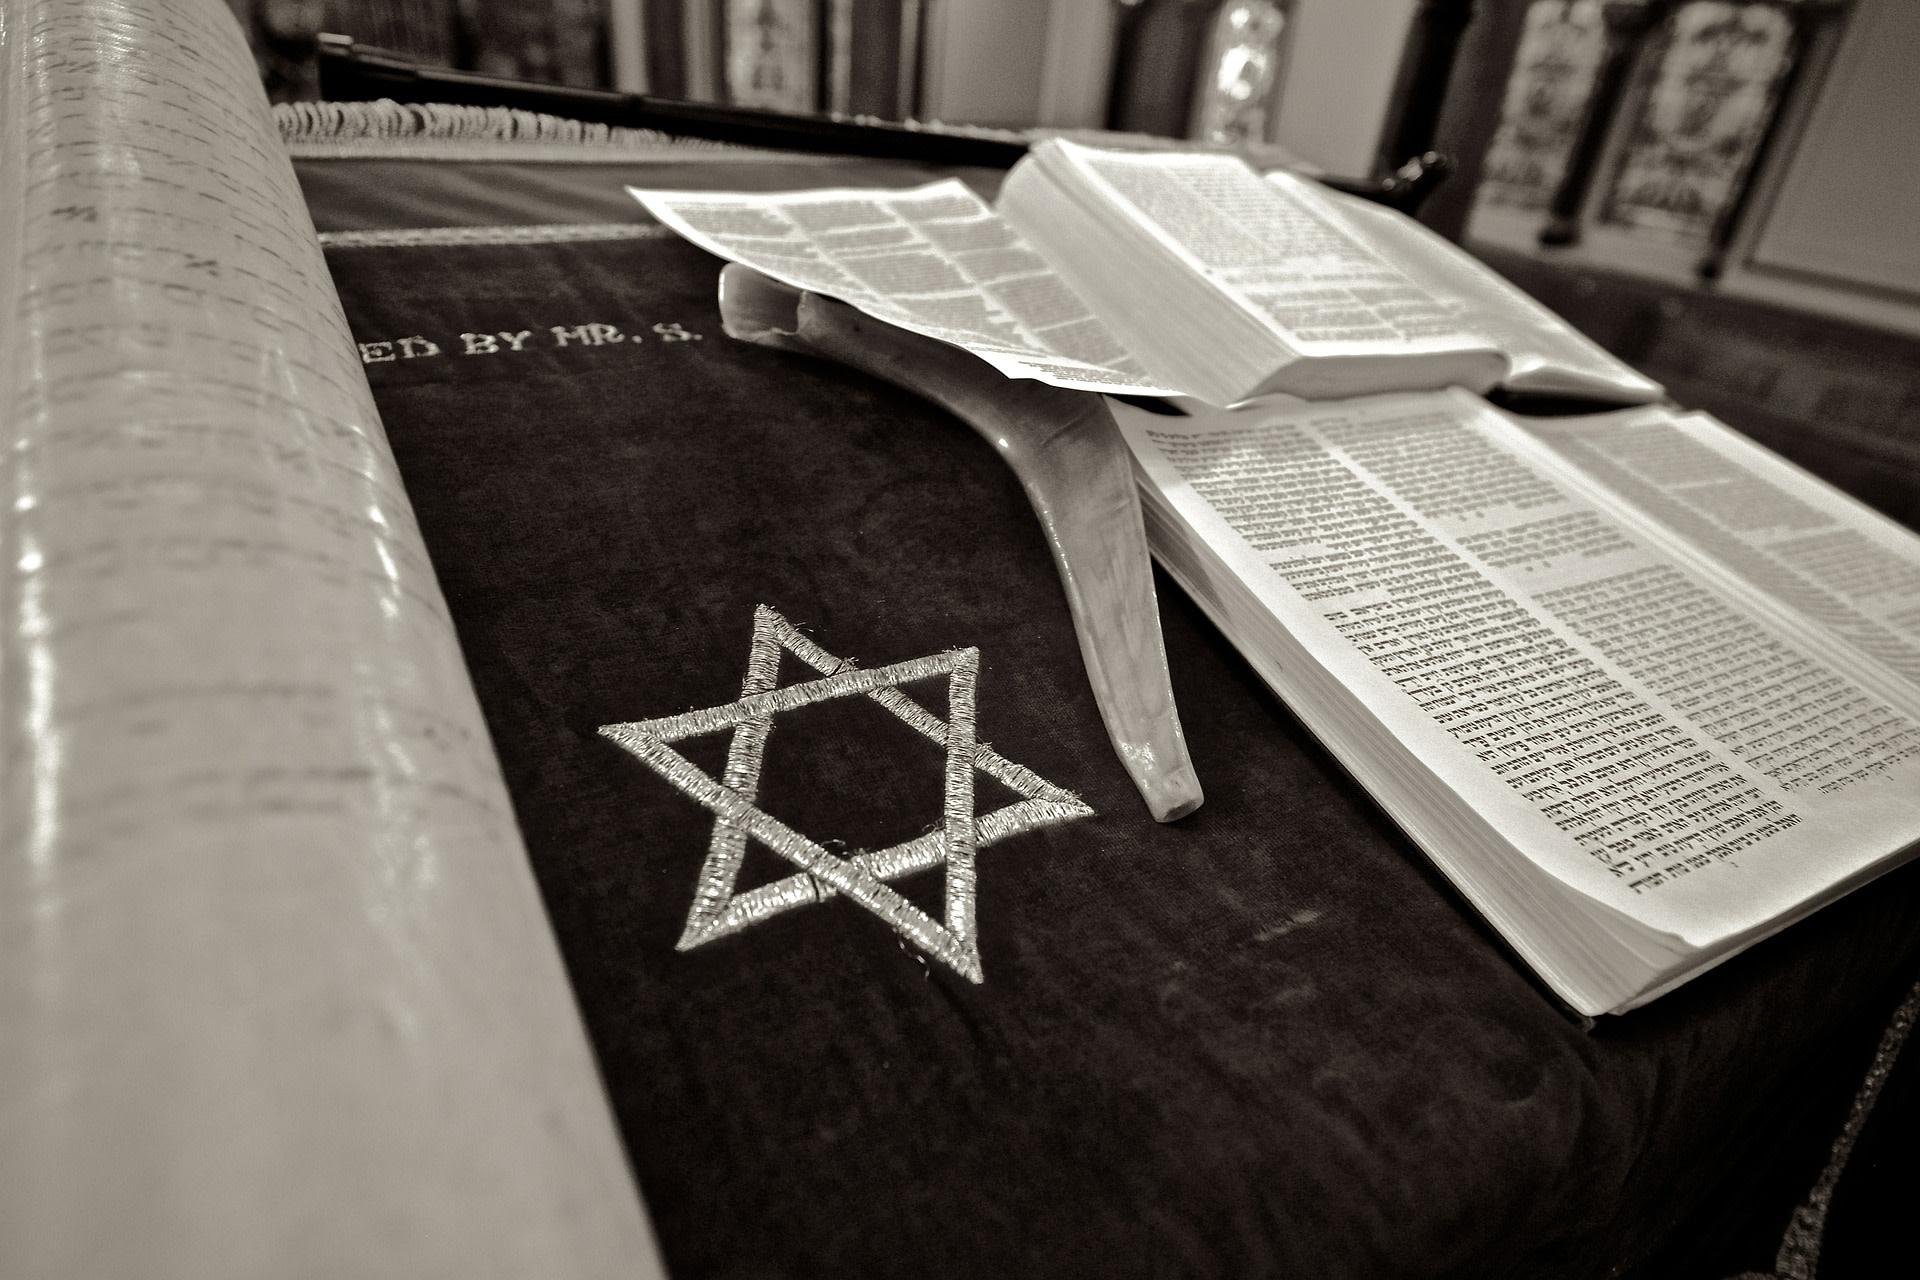 Learning Torah on the eve of Yom Kippur